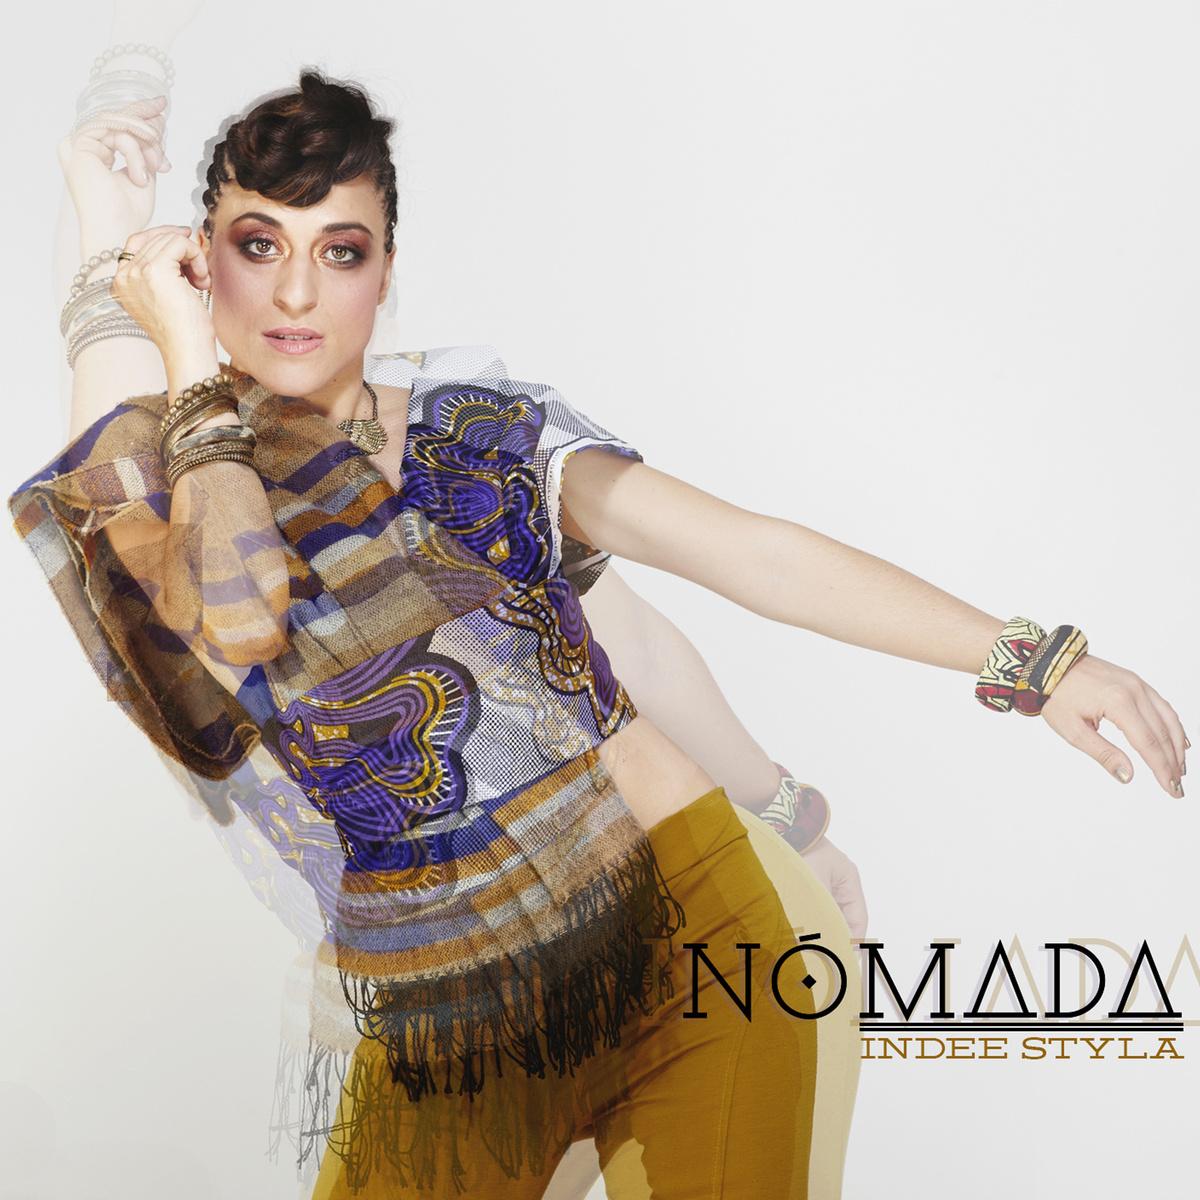 Indee_style_-_n_mada